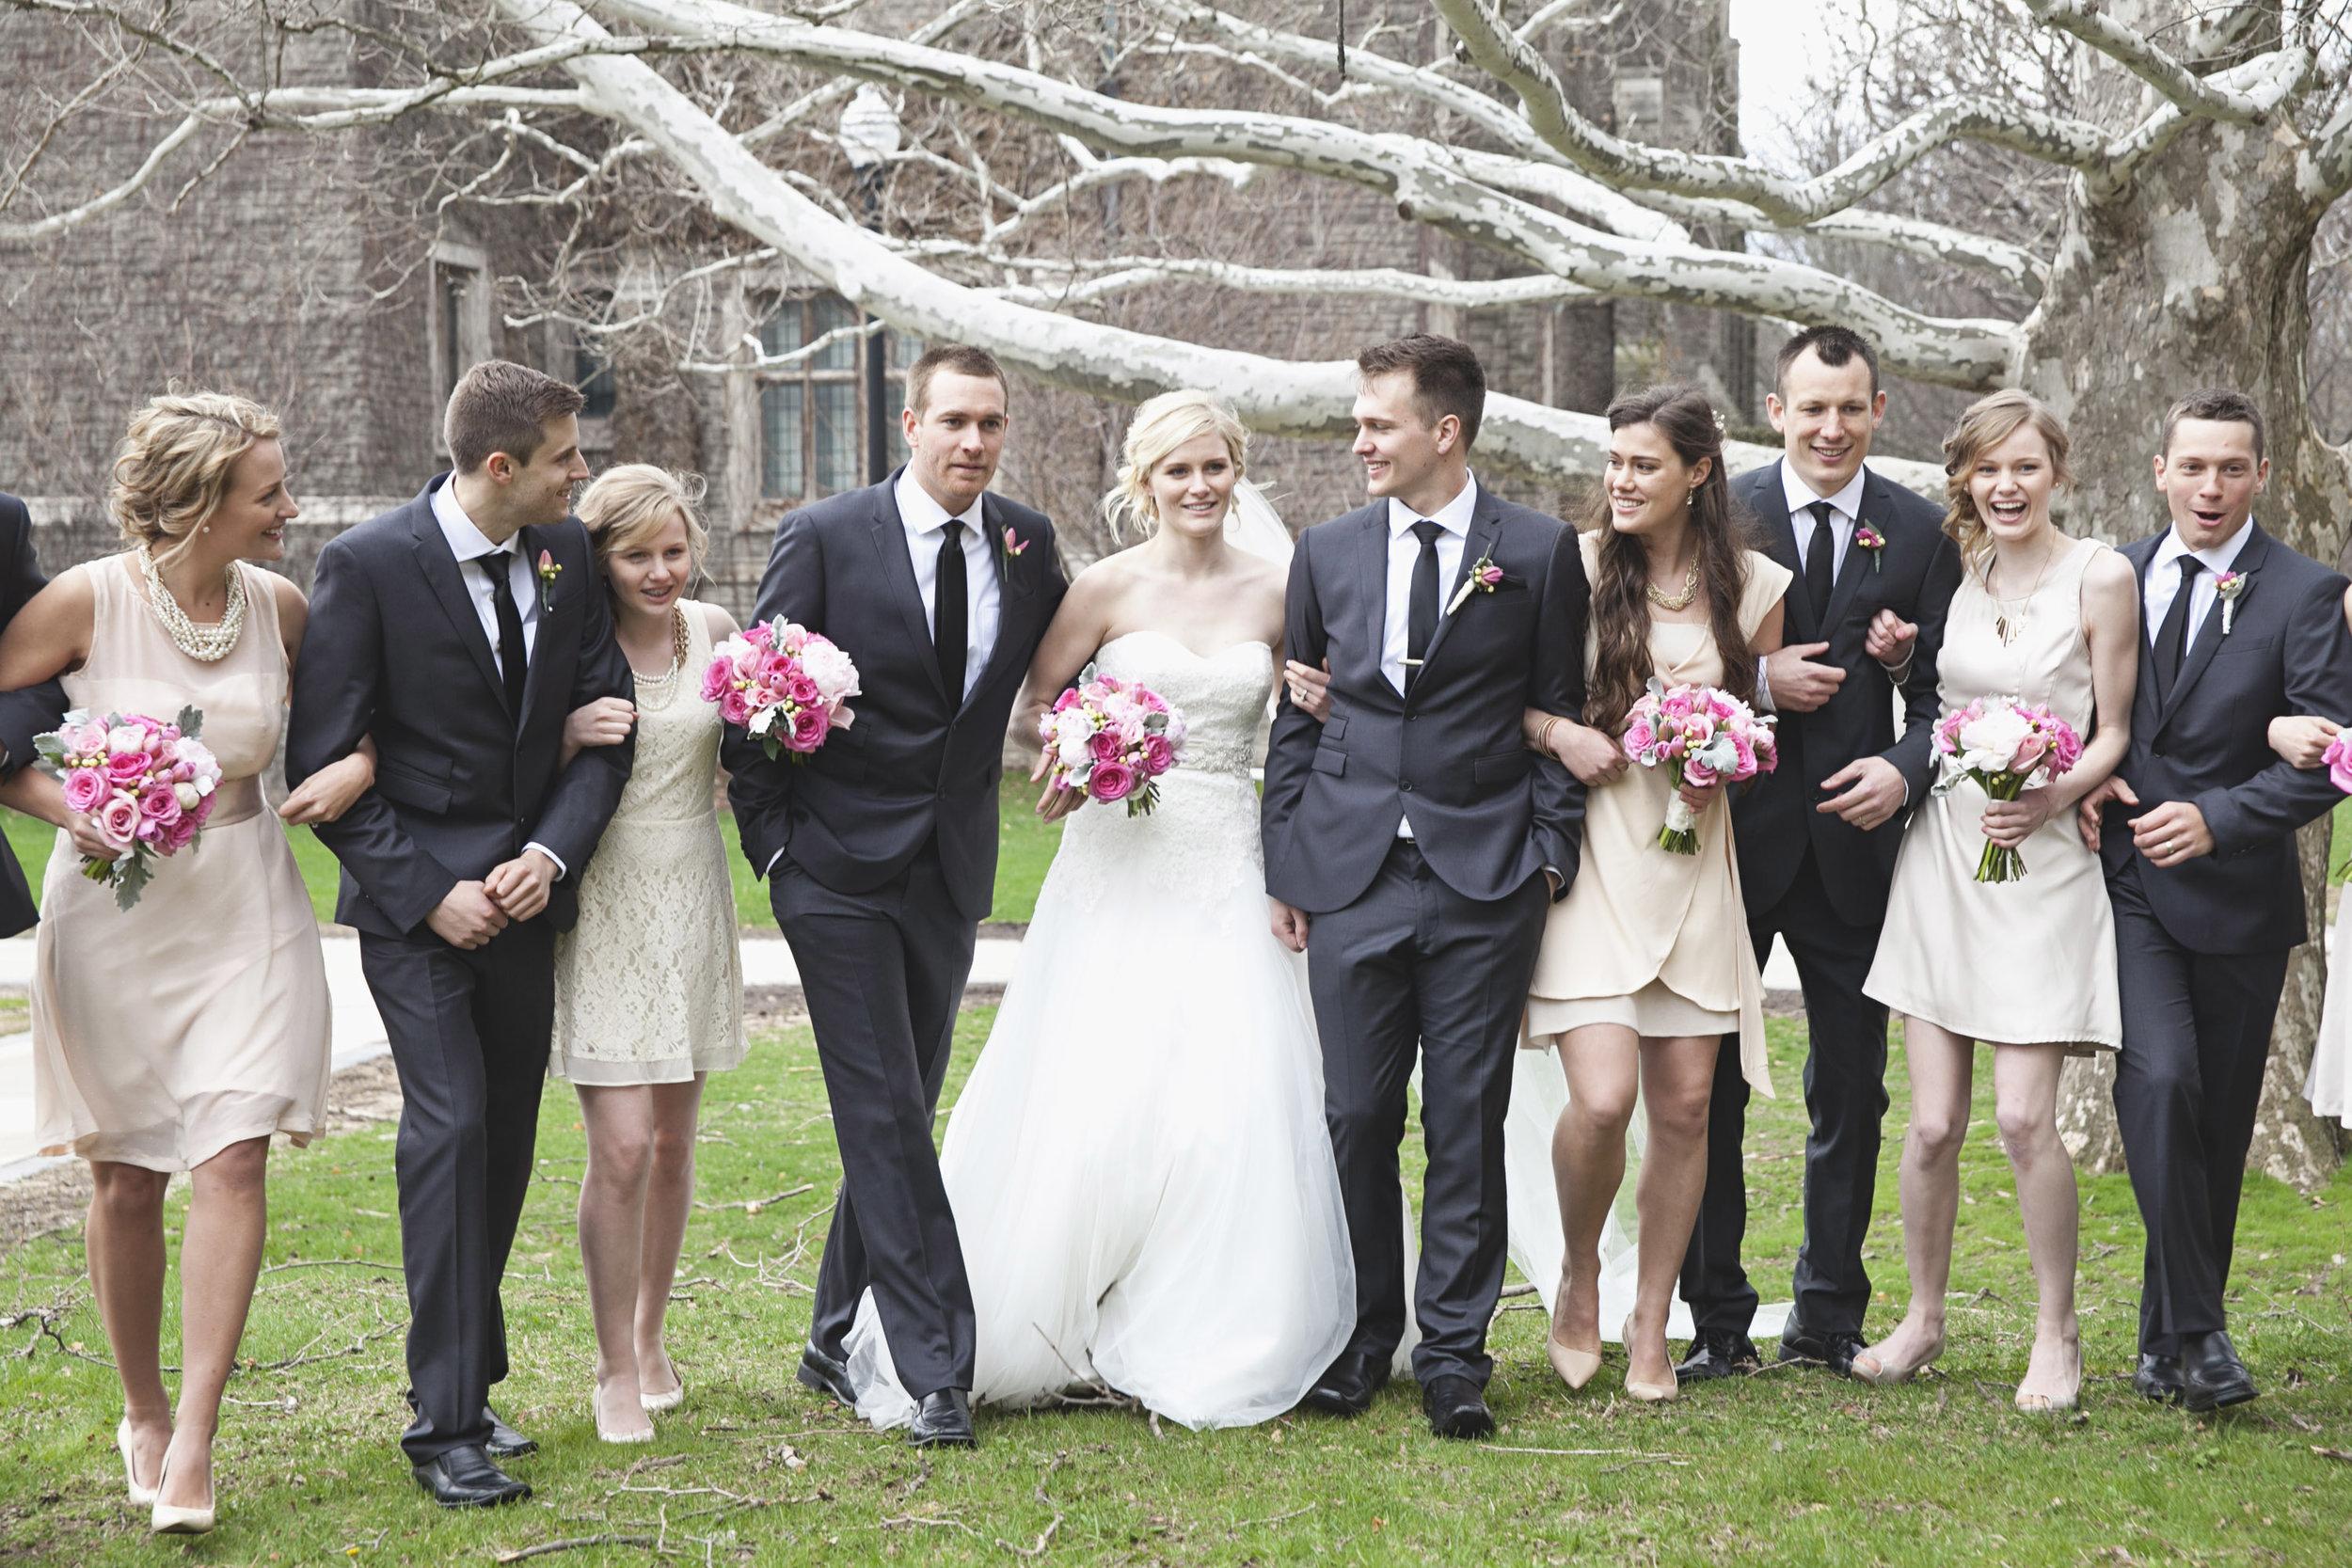 Bridal party photos at McMaster University in Hamilton, Ontario